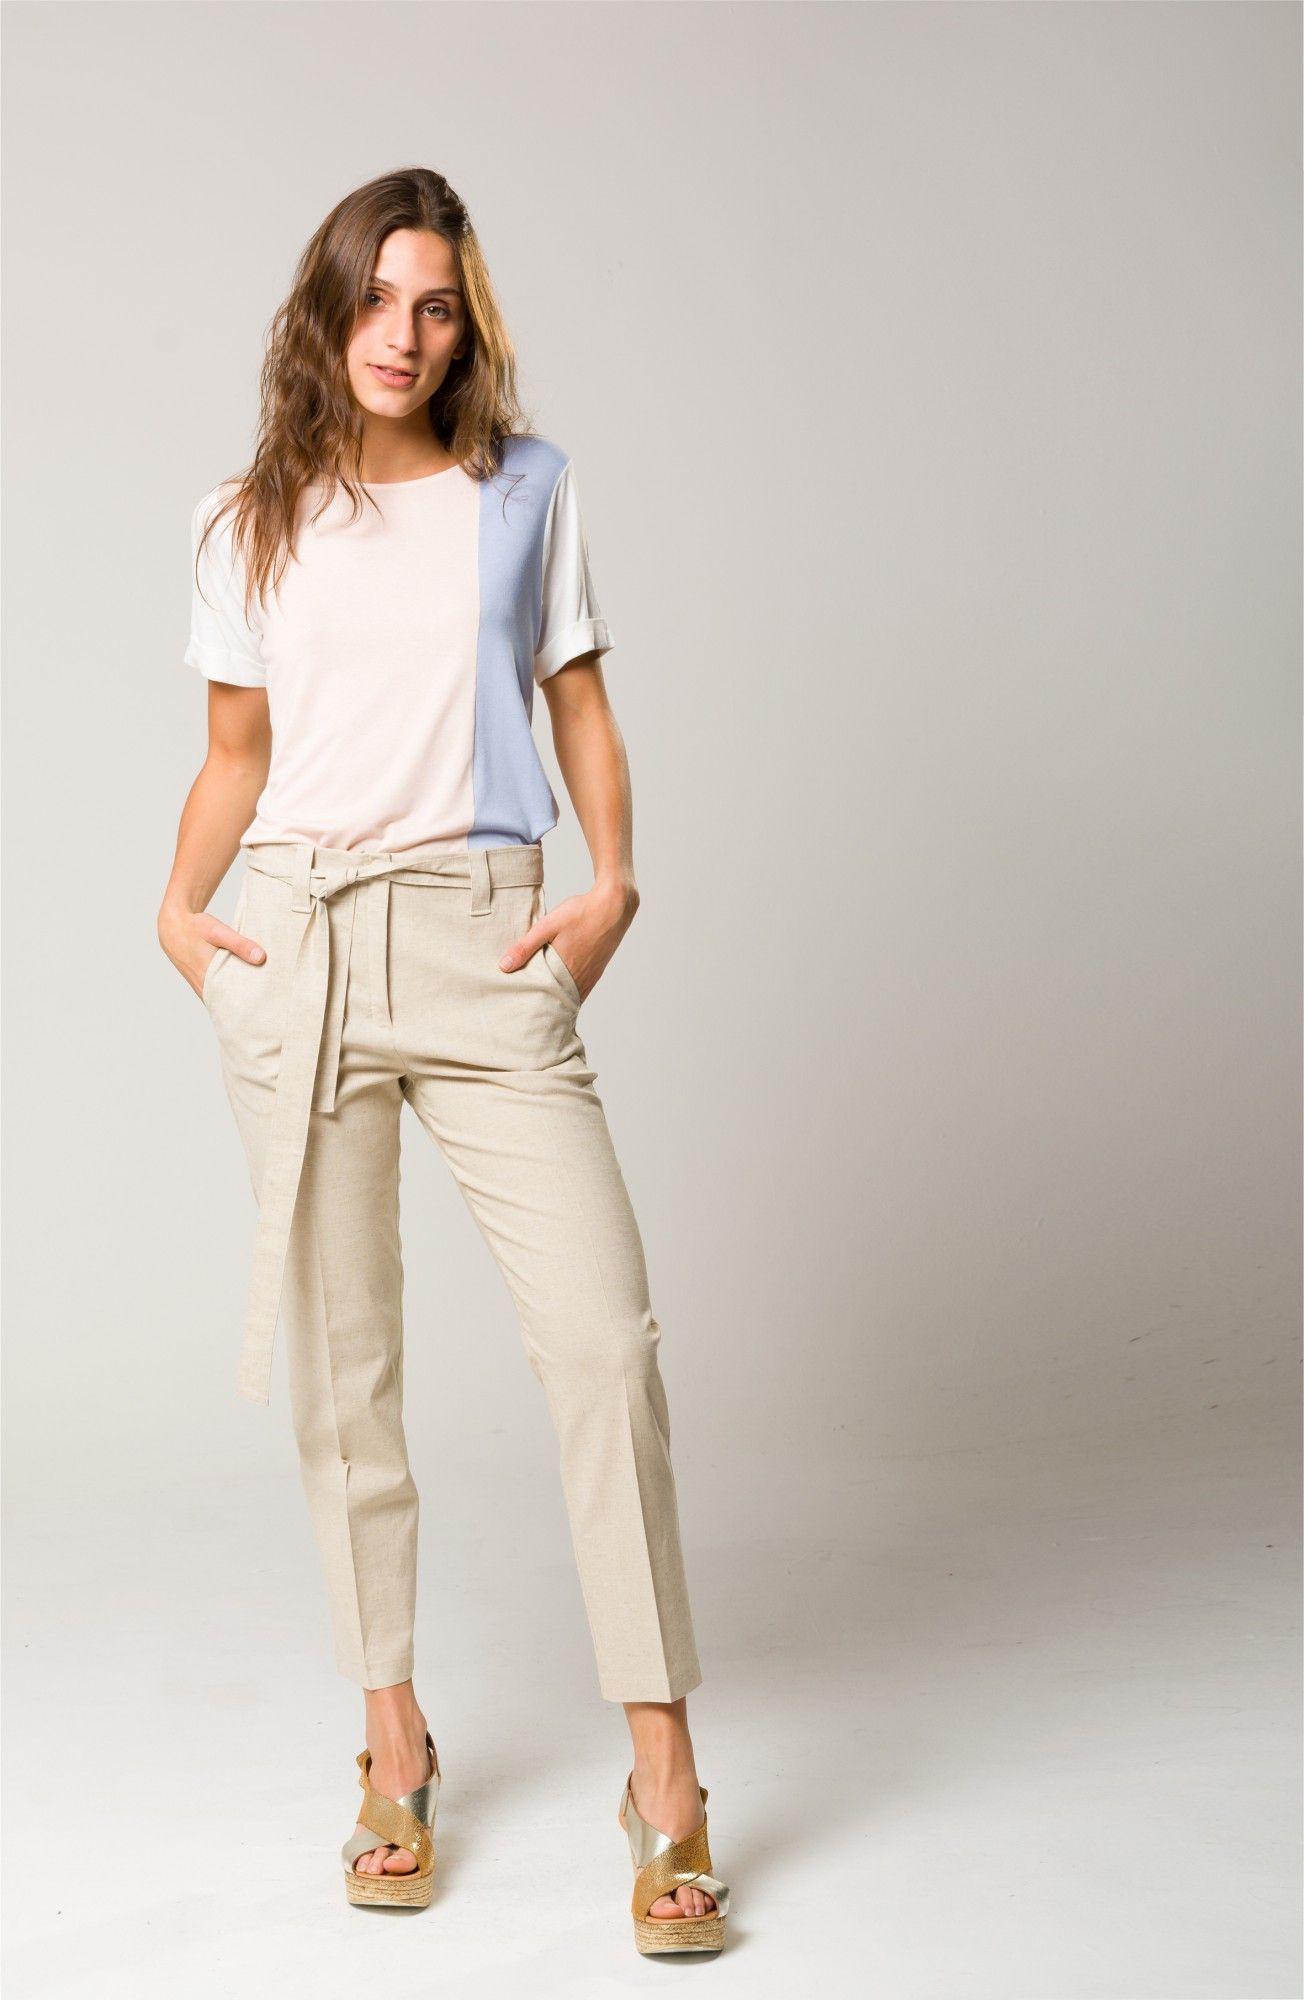 Pantalon Lino Remera Crepe De Punto Ropa Ropa De Moda Pantalon Lino Mujer